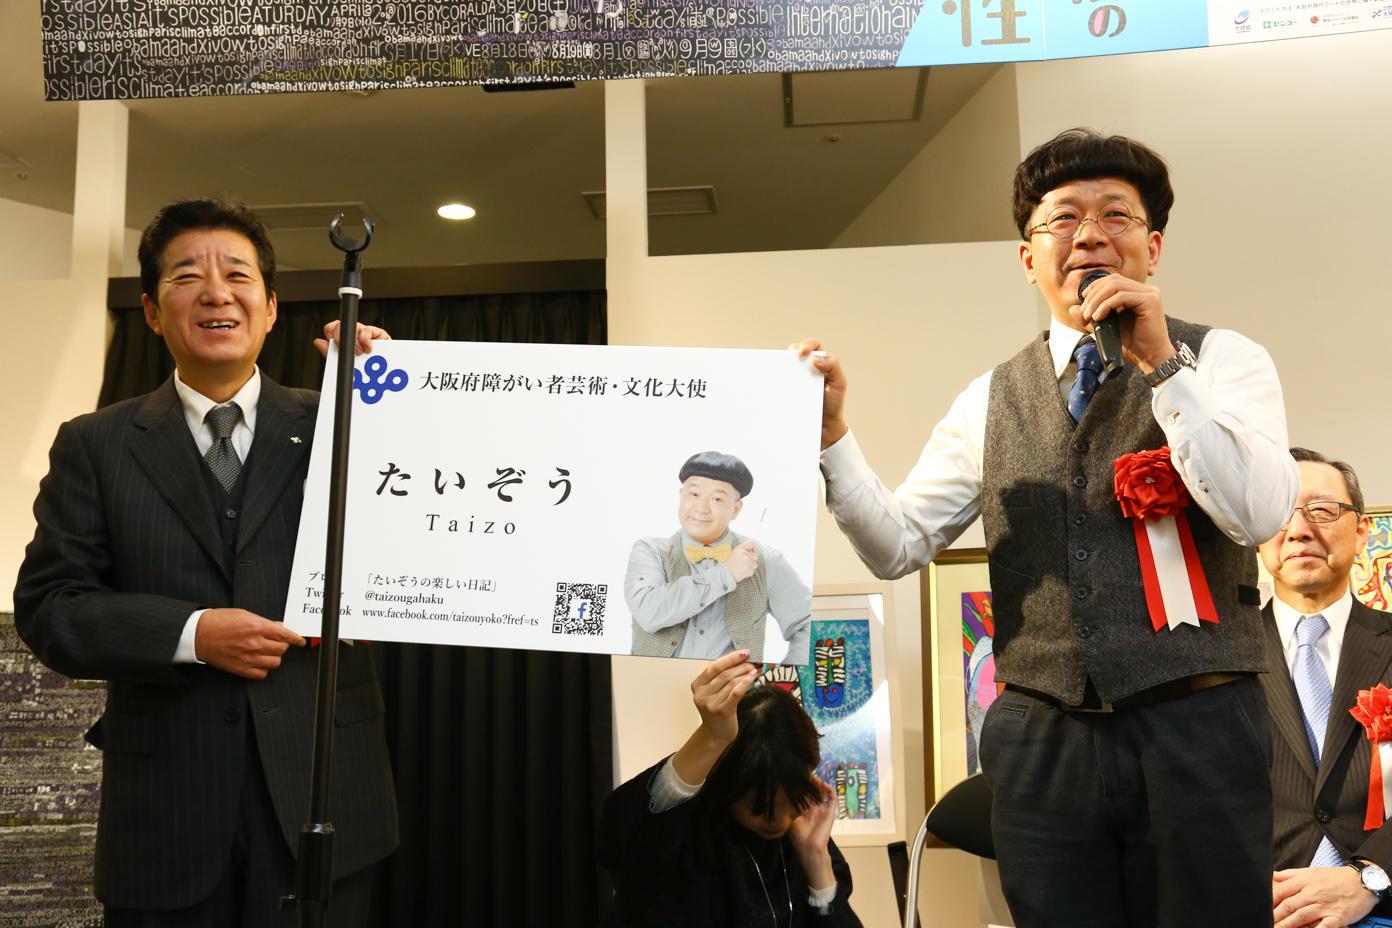 http://news.yoshimoto.co.jp/20170210155452-29ffb30141283740ecdb8976ee4f53e36de9742e.jpg